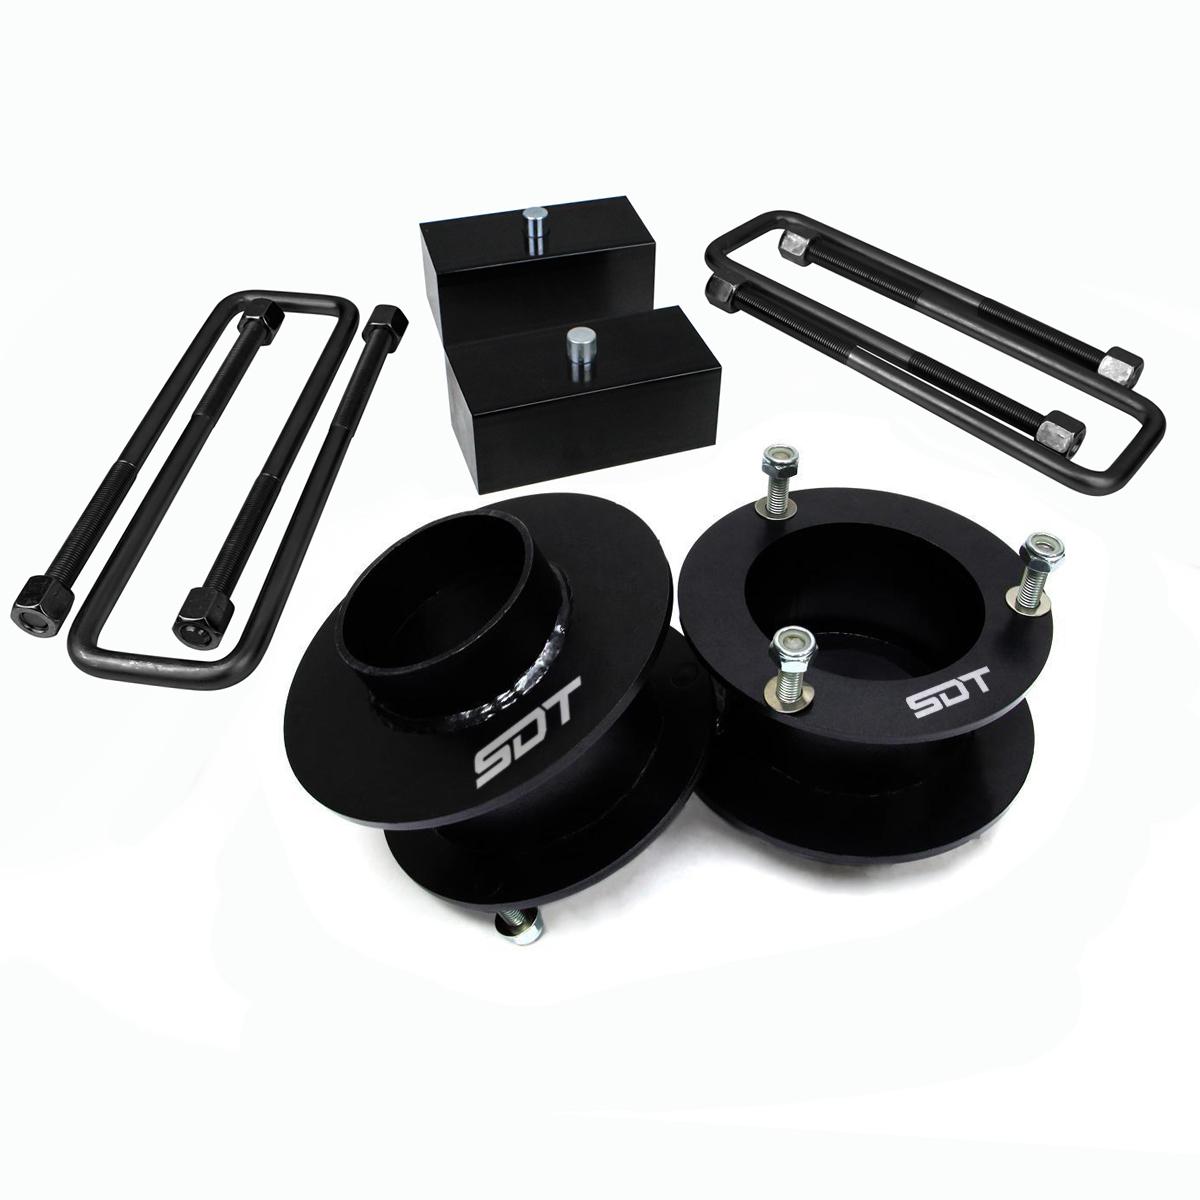 Dodge Ram 2500 3500 3 inch Front 2 inch Rear Full Leveling Lift Kit 2003 2004 2005 2006 2007 2008 2009 2010 2011 2012 2013